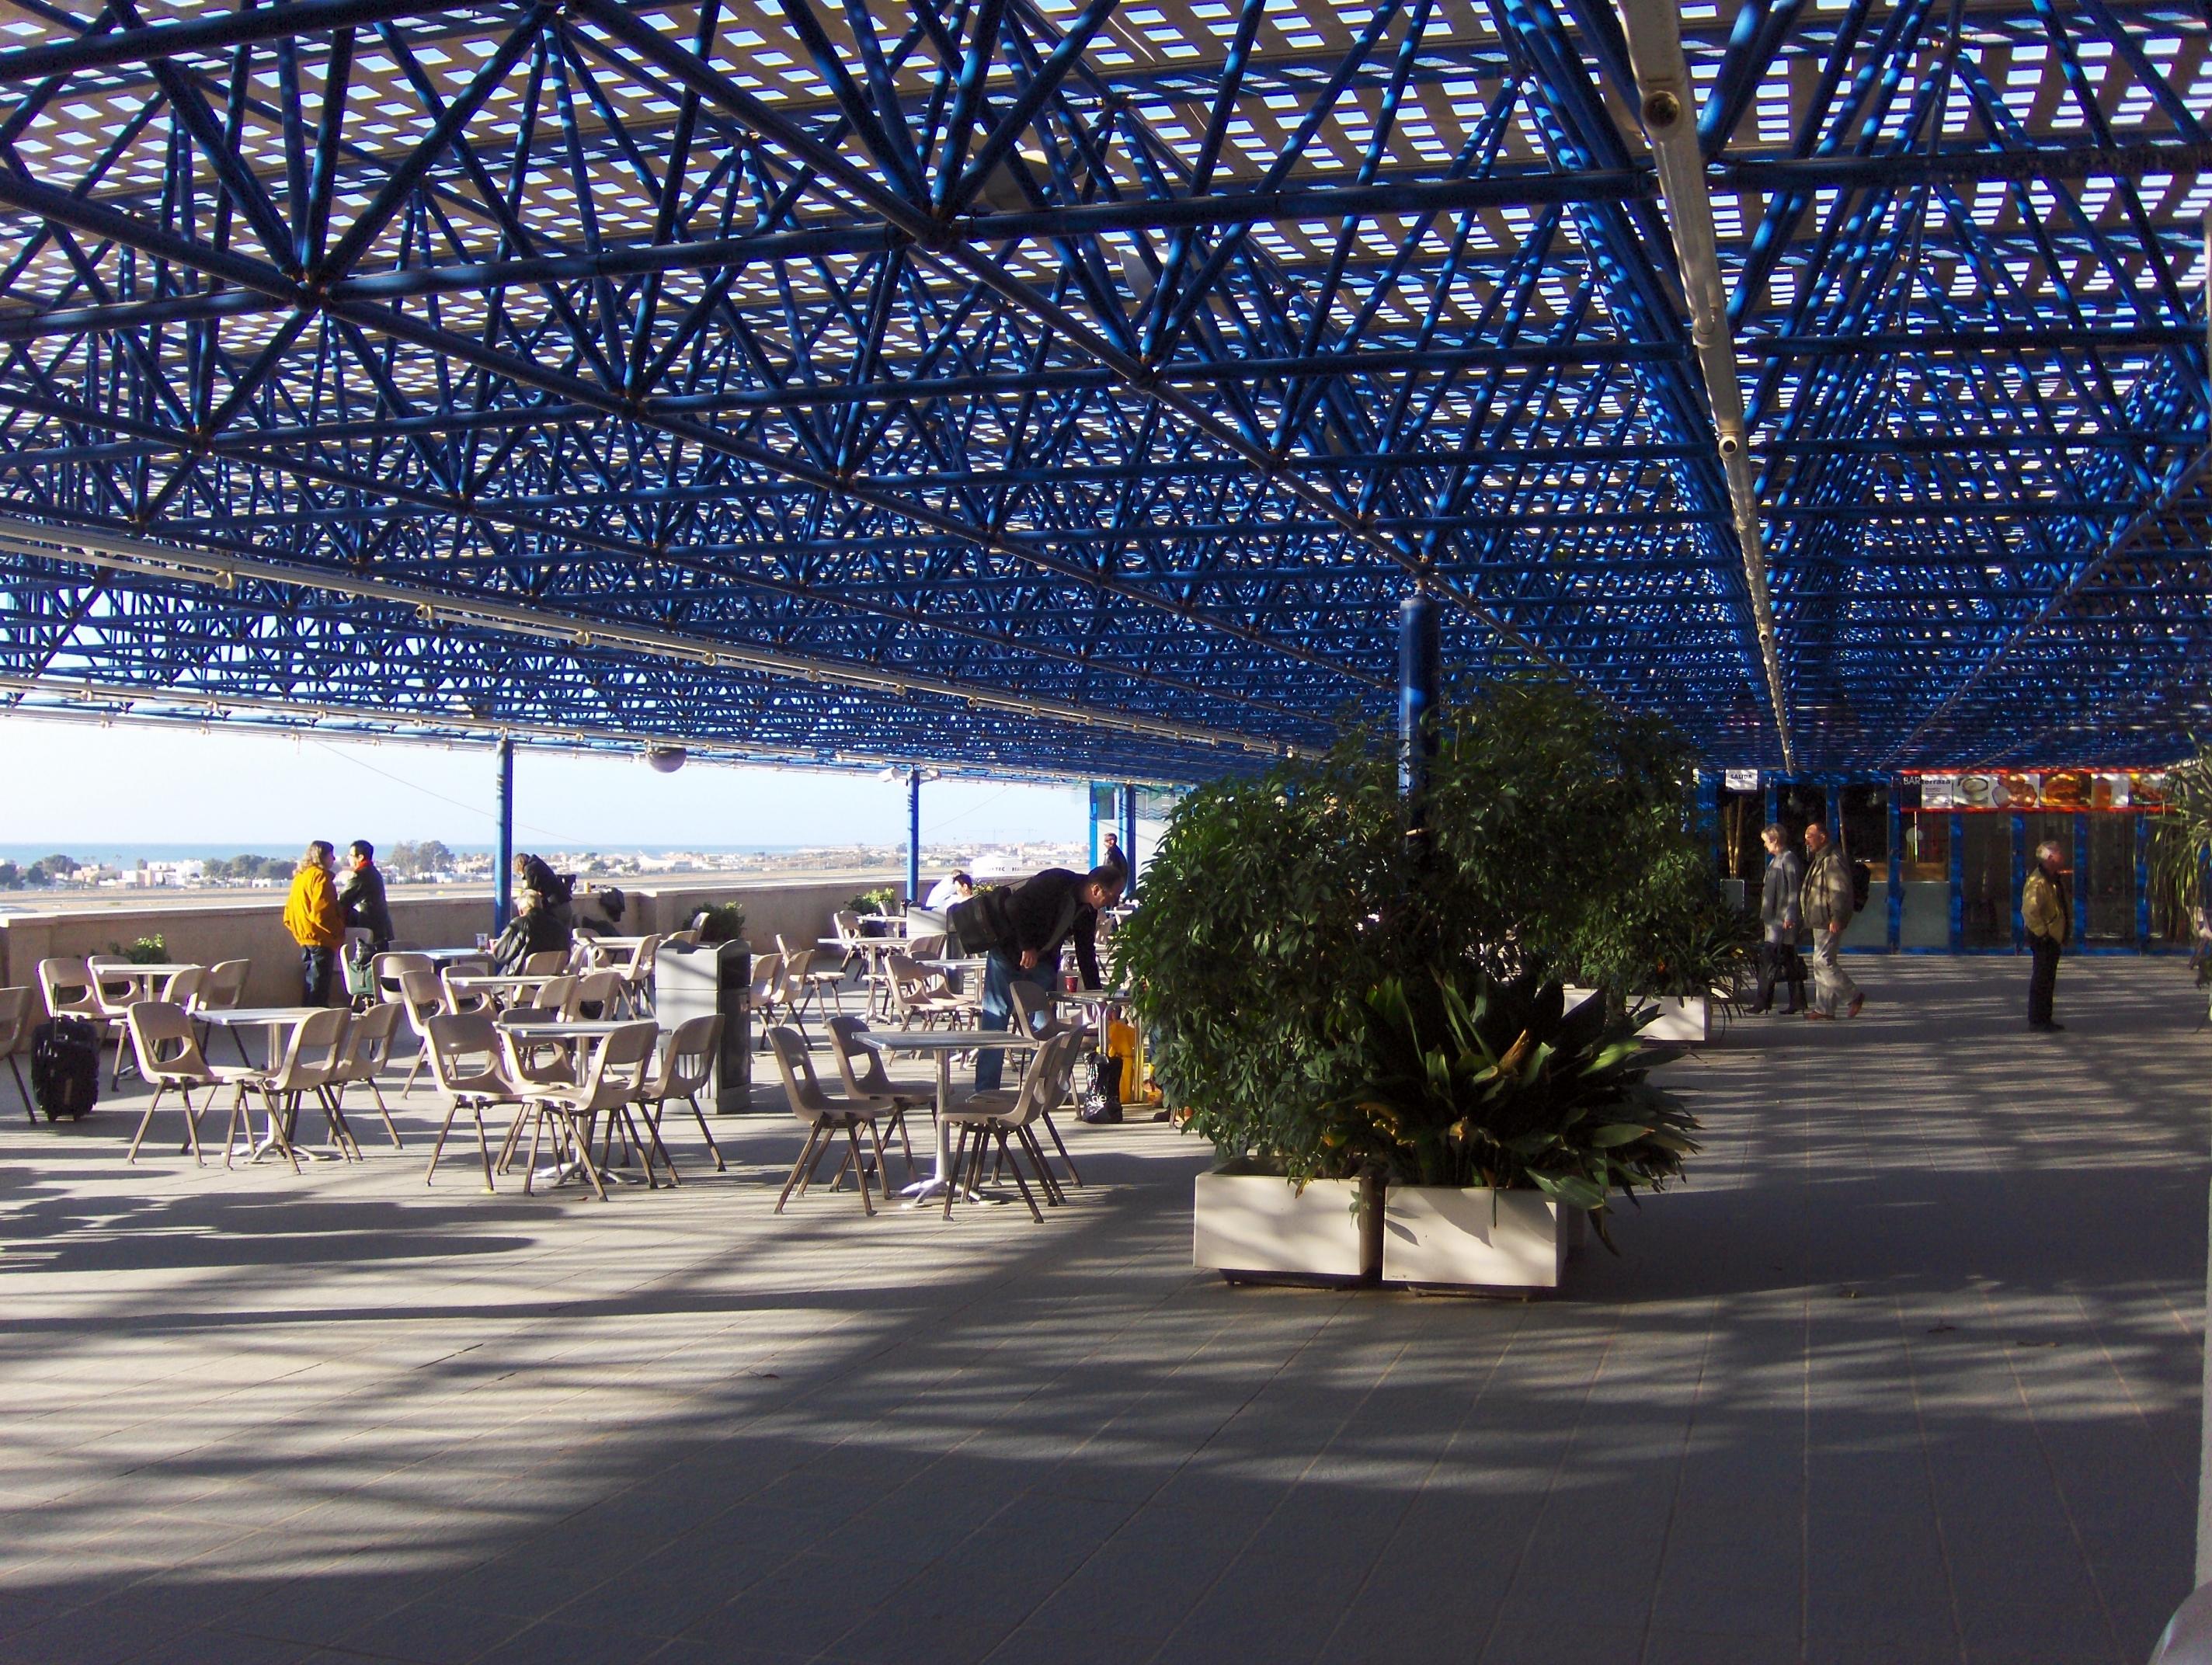 File Aeropuerto Almería Fumadores Jpg Wikimedia Commons